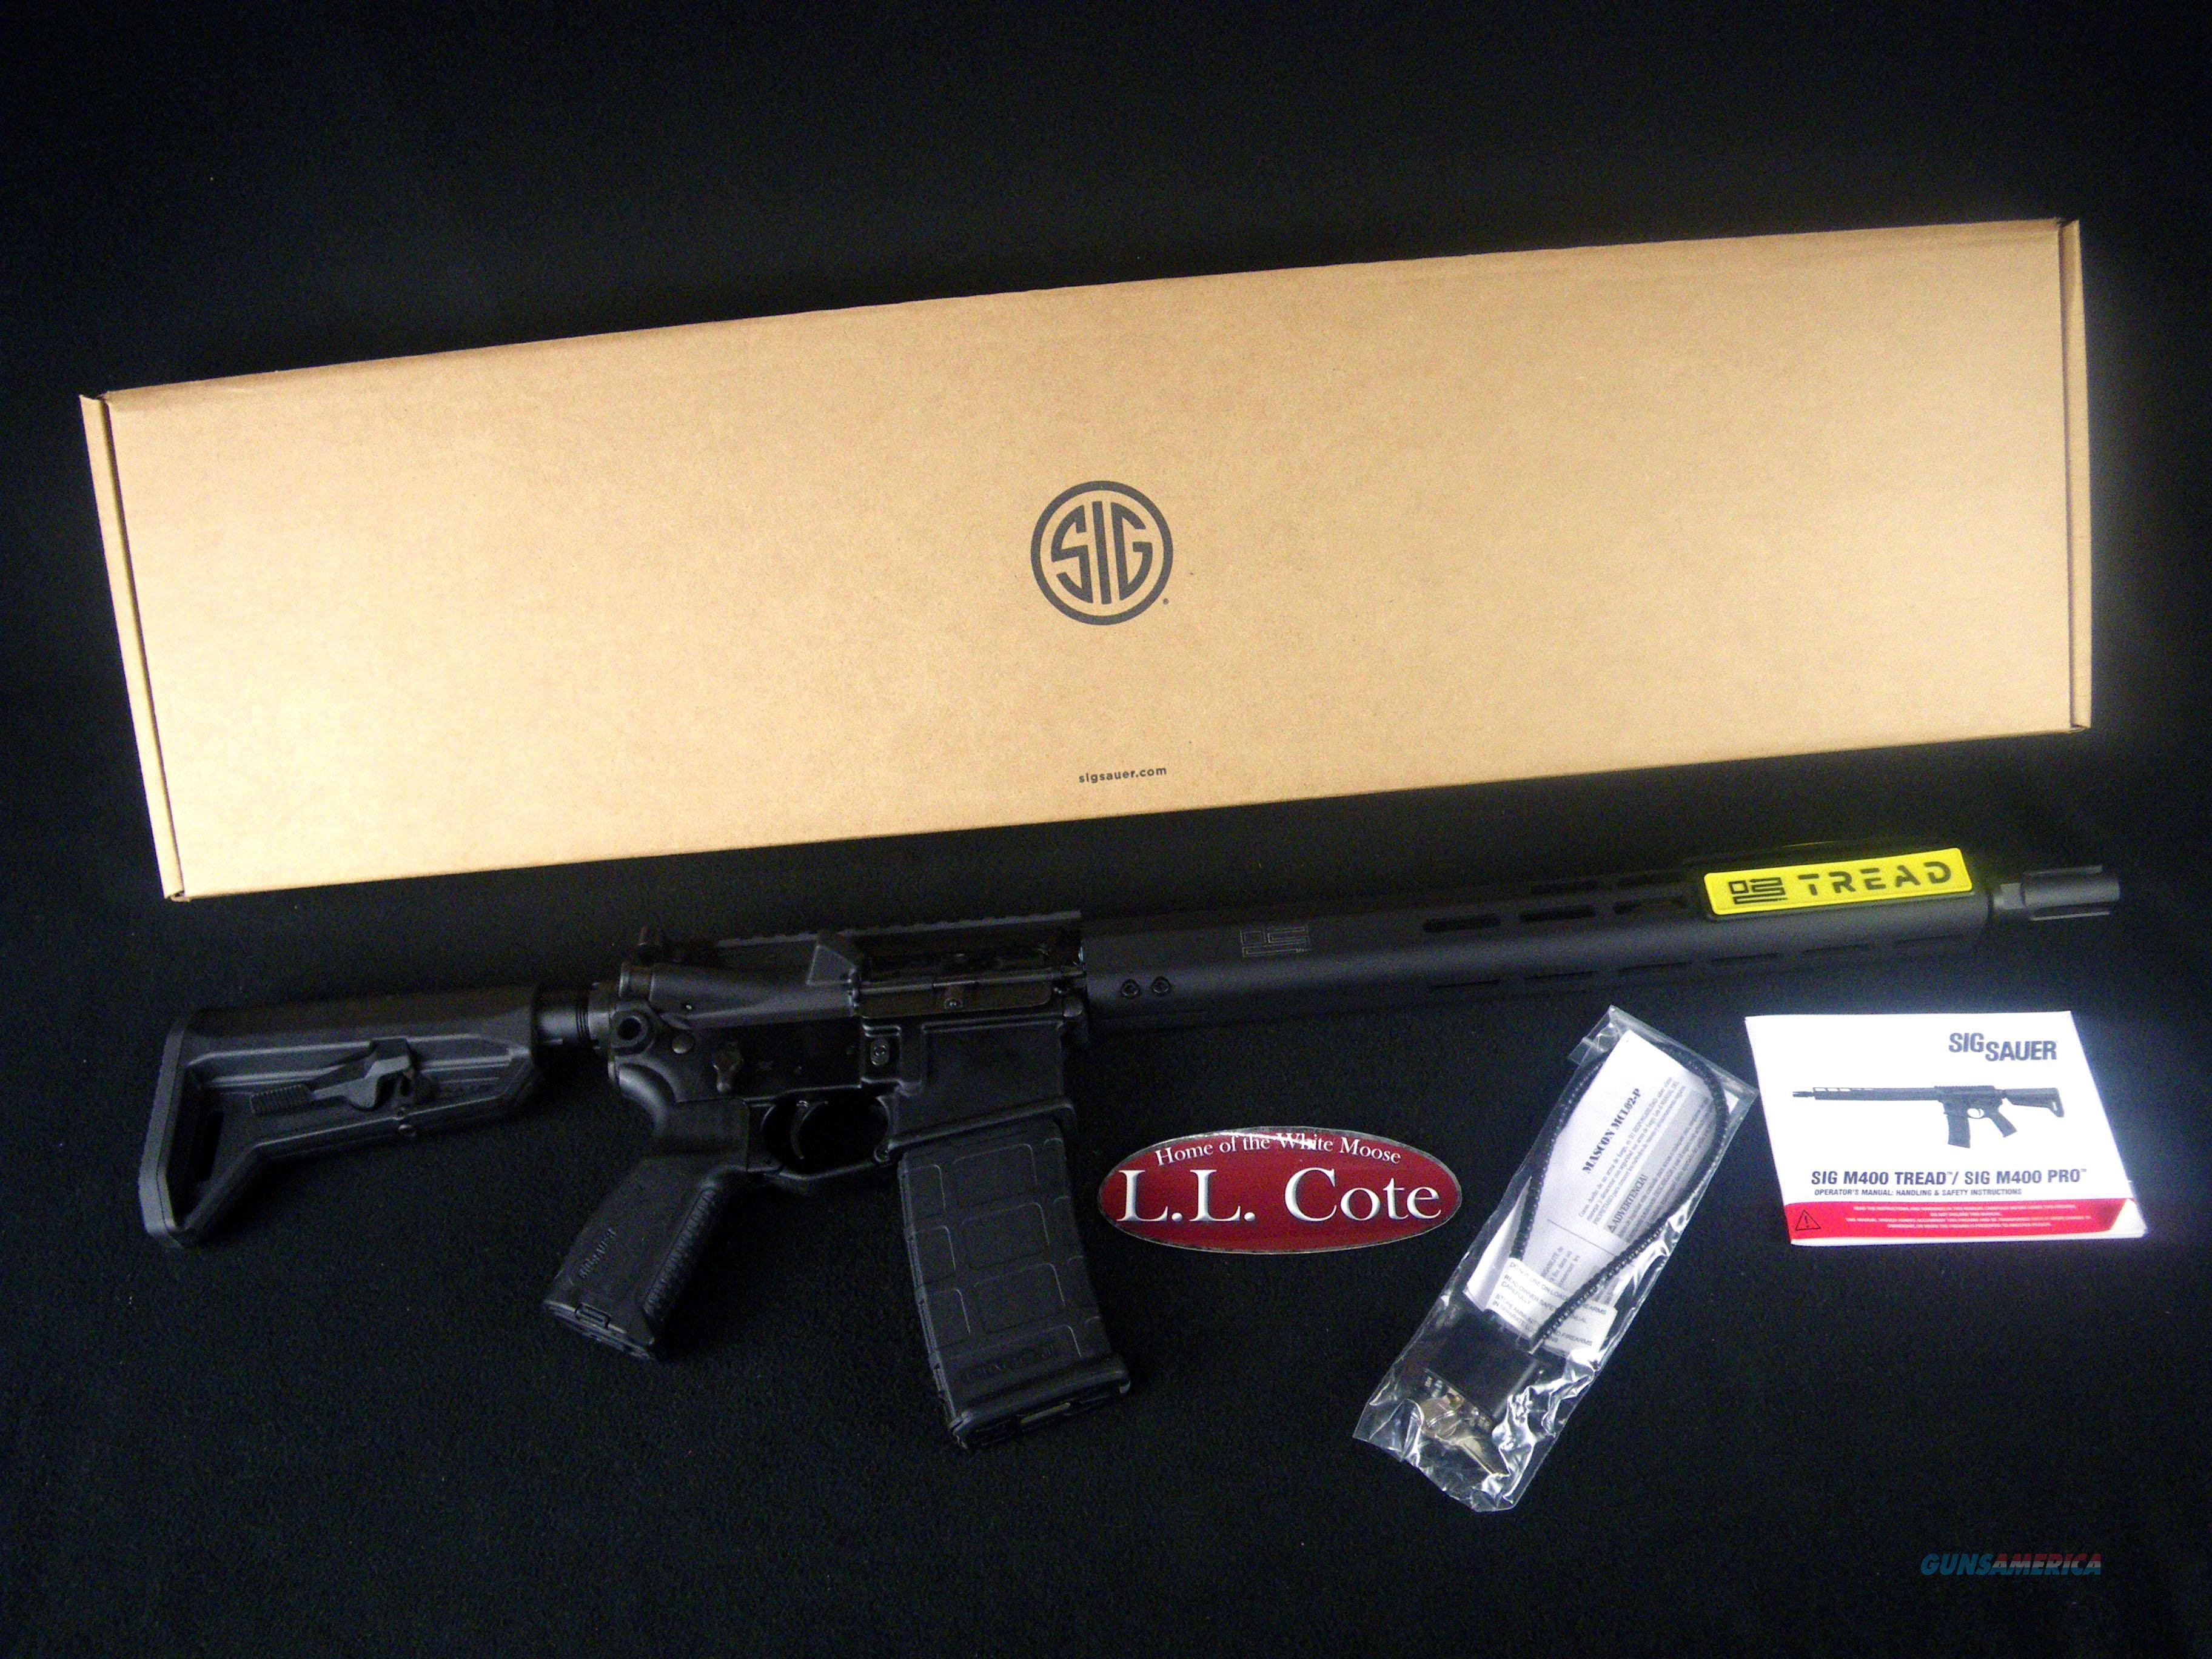 "Sig Sauer M400 Tread 5.56 NATO 16"" NEW RM400-16B-TRD  Guns > Rifles > Sig - Sauer/Sigarms Rifles"